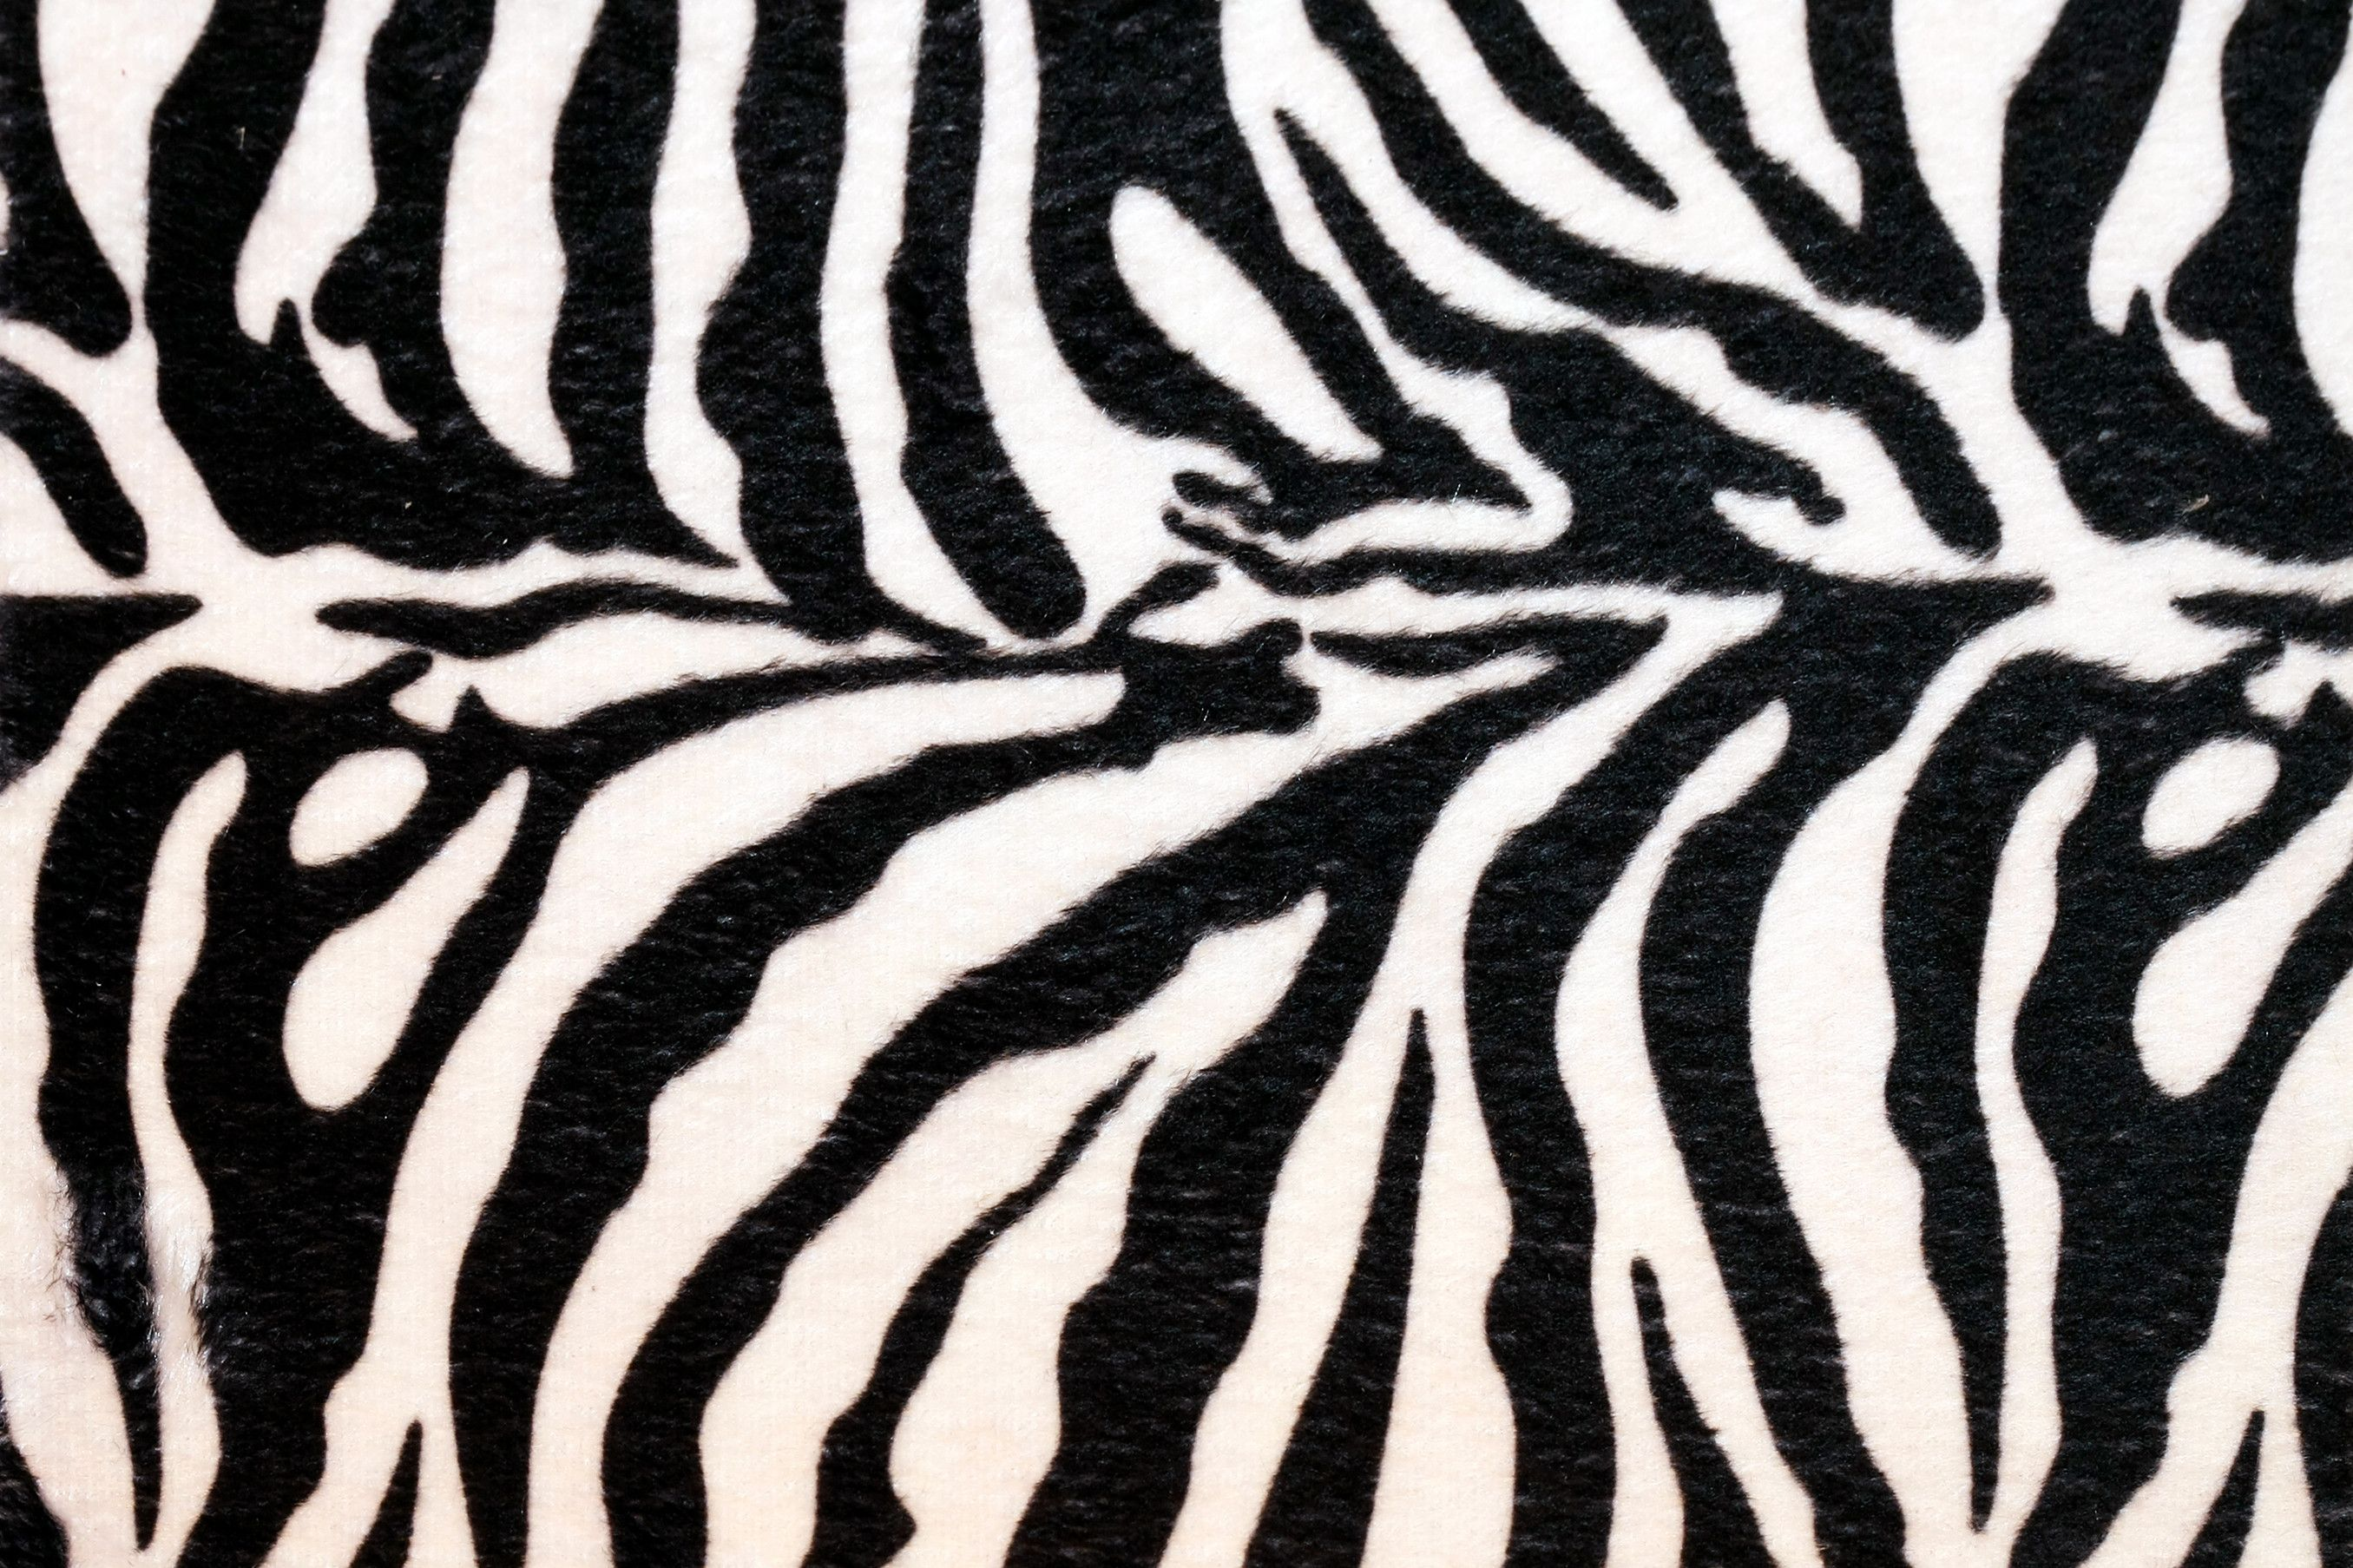 Pin by Aleczandra Seocanac on Zebra stuff.